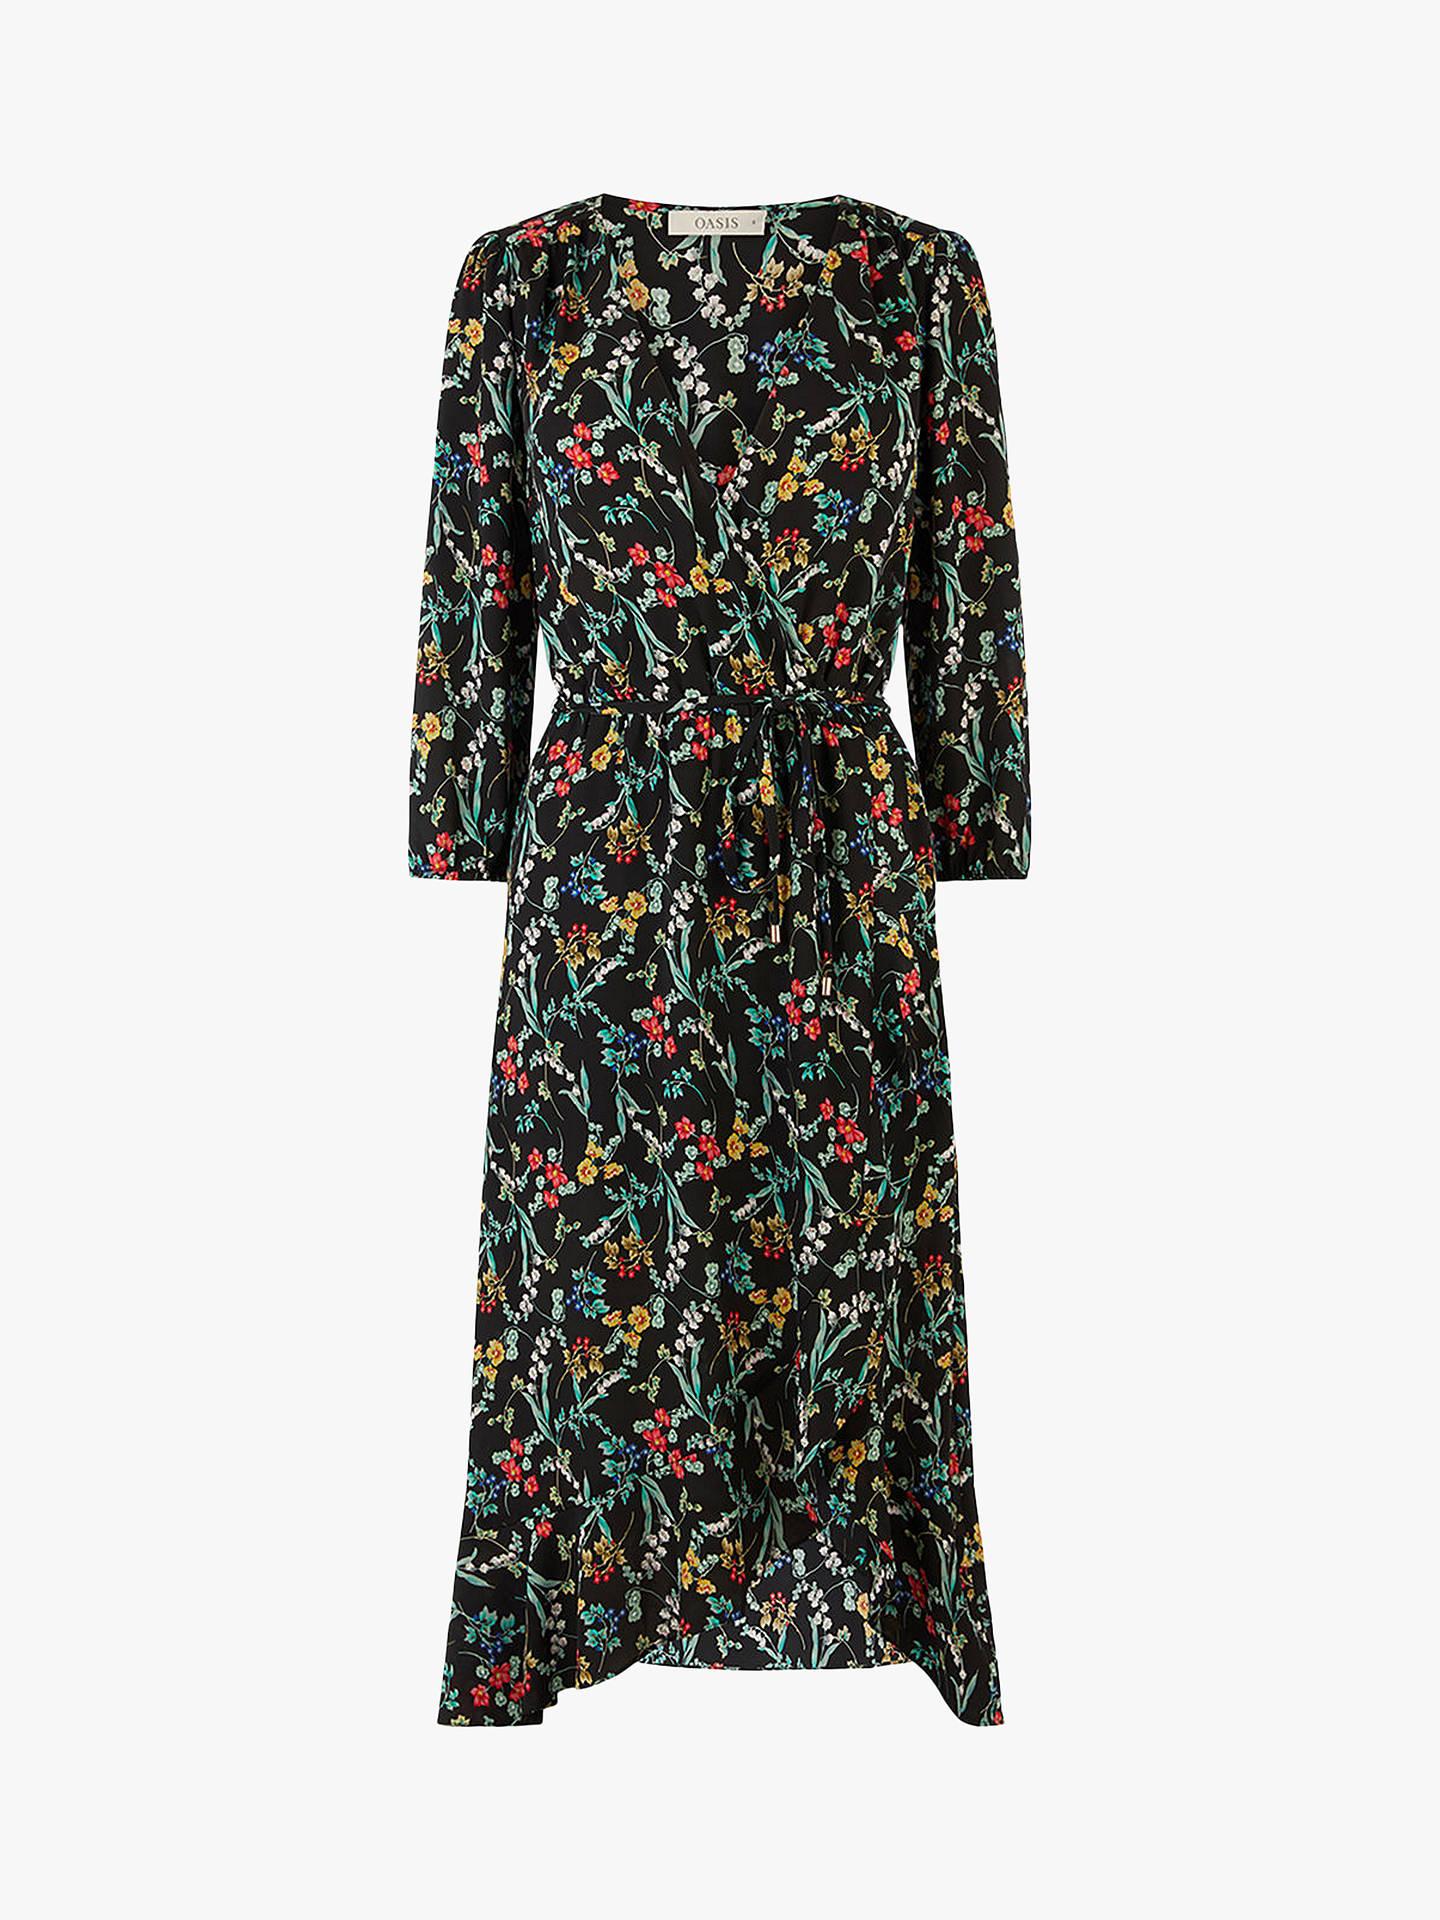 6dcd754050fa Buy Oasis Flower Wrap Midi Dress, Multi Black, 8L Online at johnlewis.com